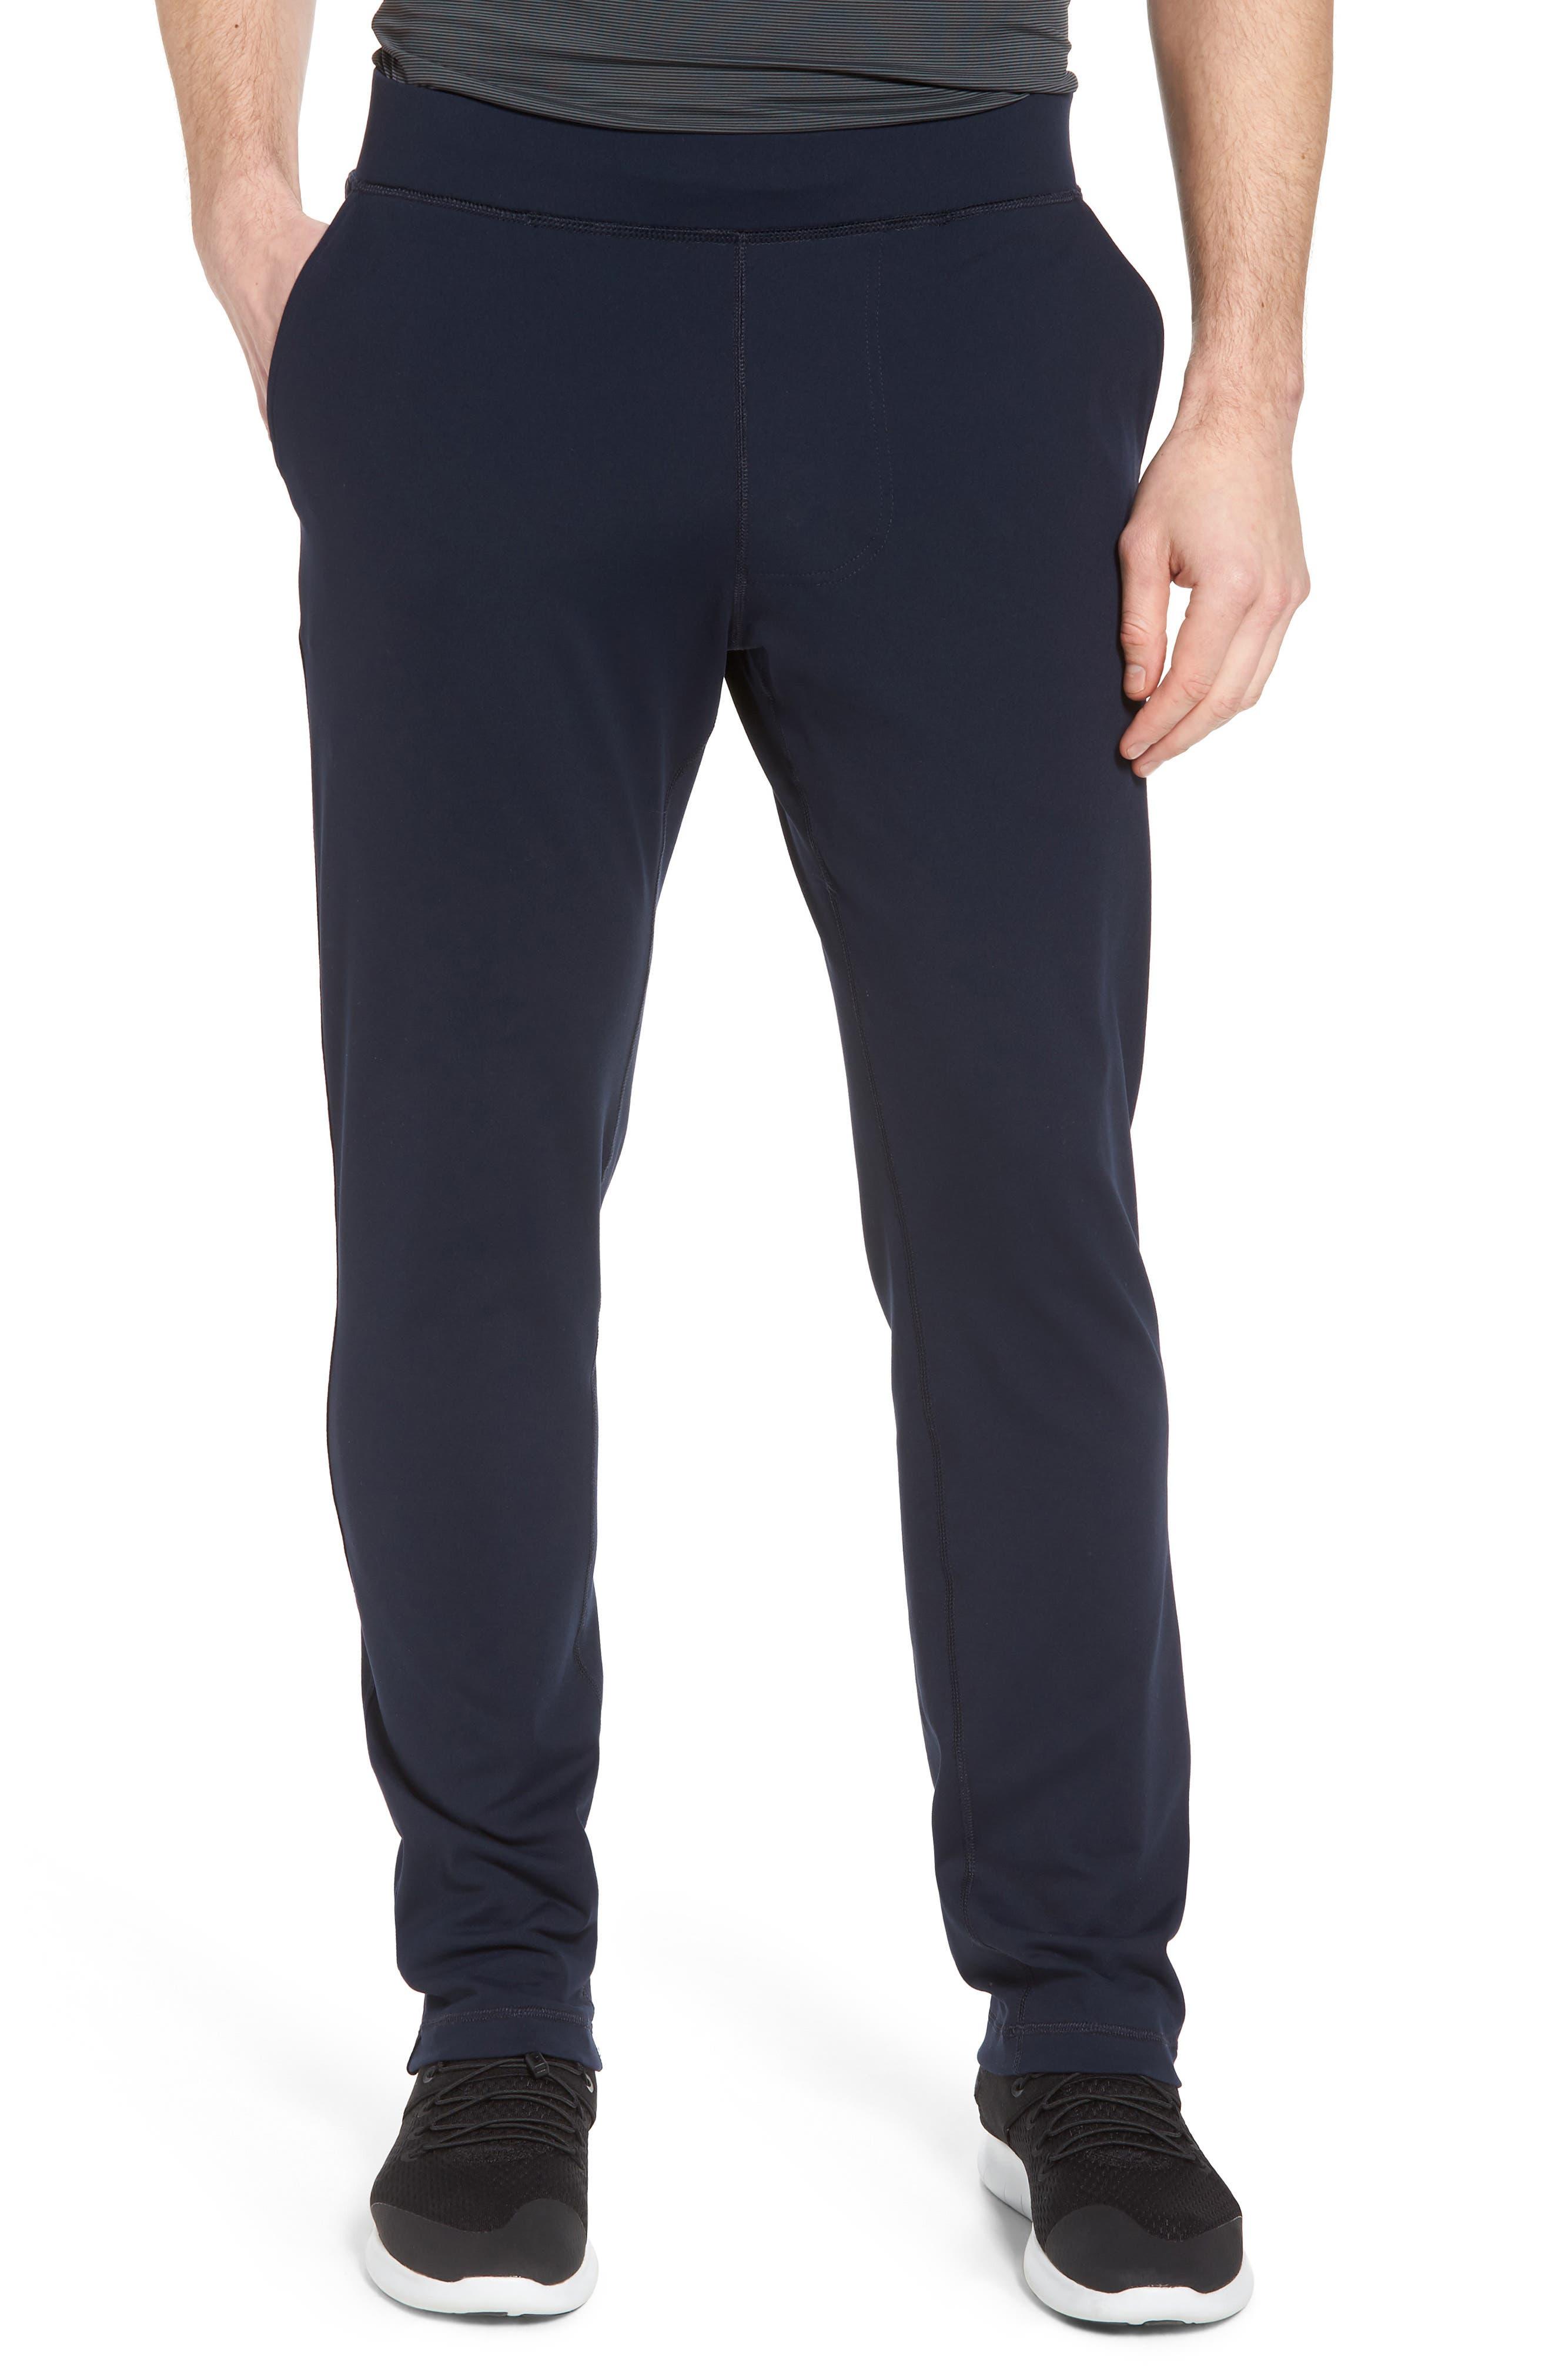 206 Pants,                         Main,                         color, Navy